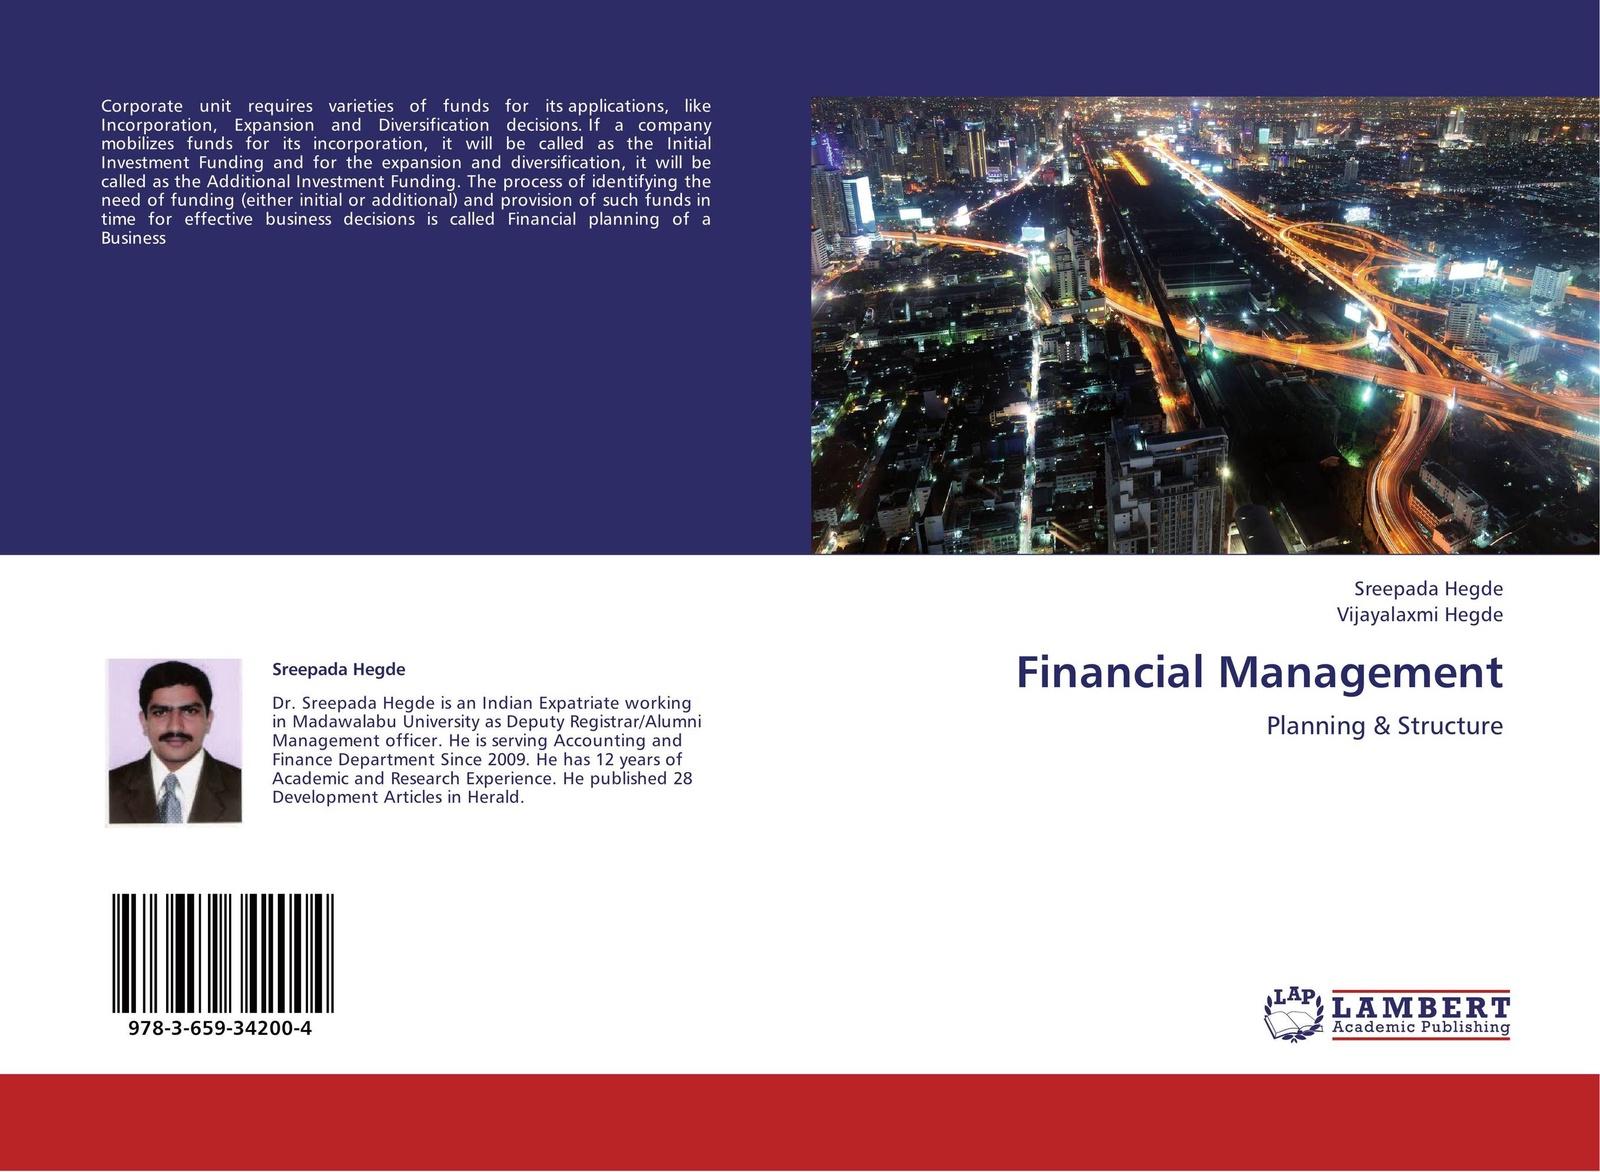 Sreepada Hegde and Vijayalaxmi Hegde Financial Management цена